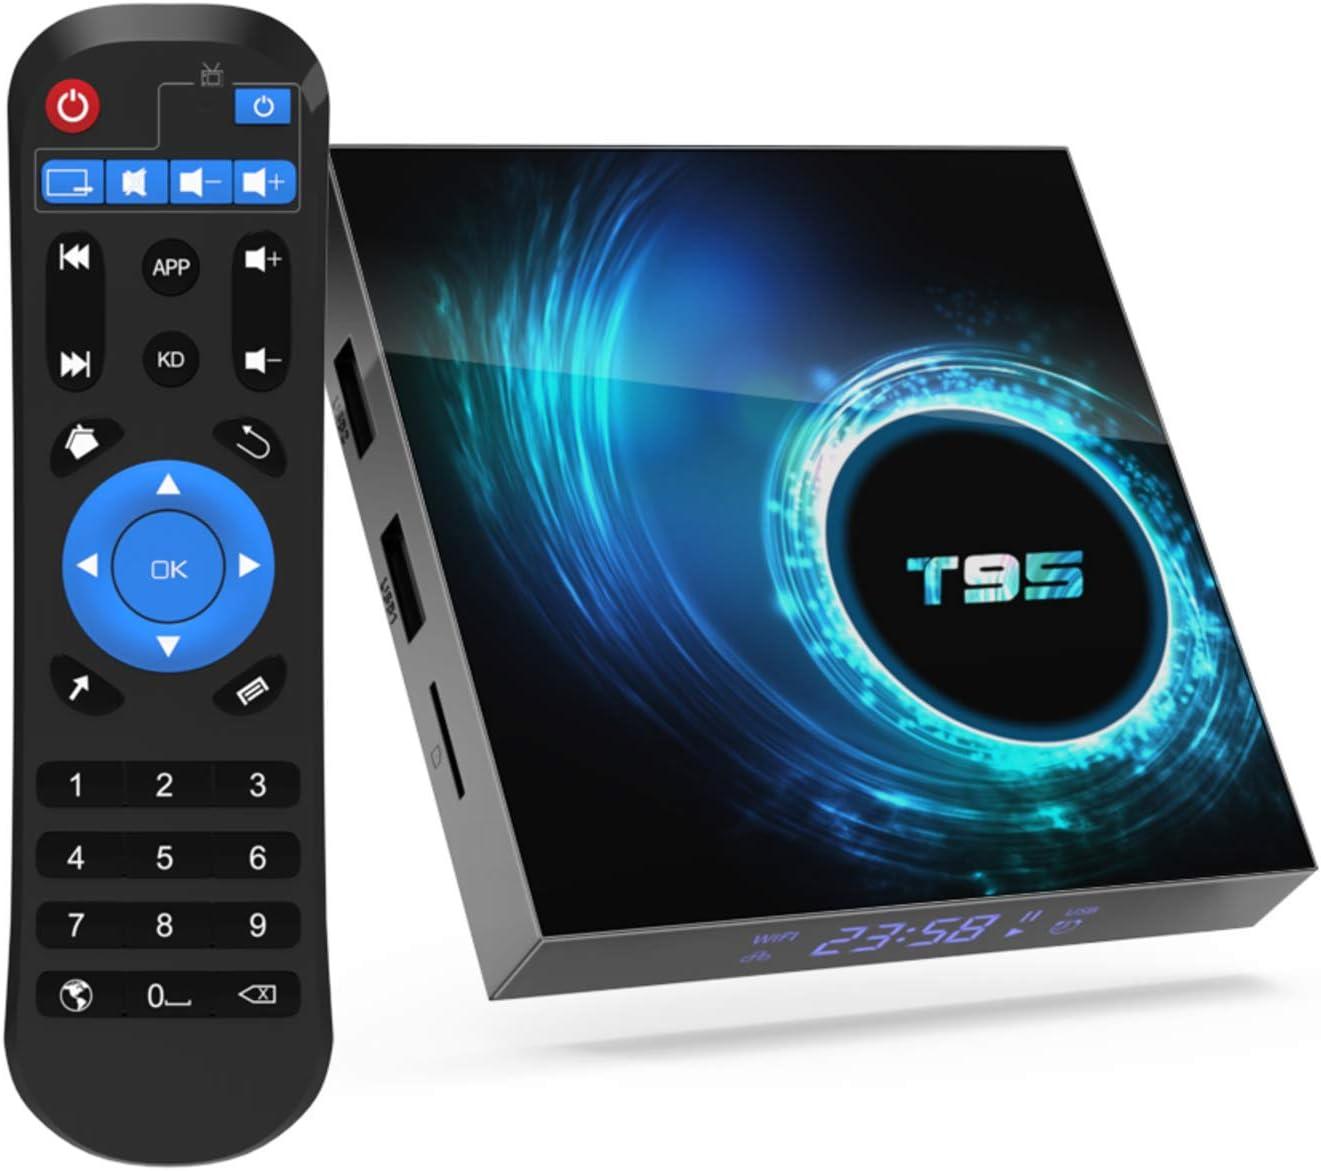 T95 Android 10.0 TV Box, Android Box 4GB RAM 64GB ROM Allwinner H616 Quad core 64-bit, Support 6K HD/ 3D/ H.265 Ethernet 2.4/5G Dual WiFi Bluetooth 5.0